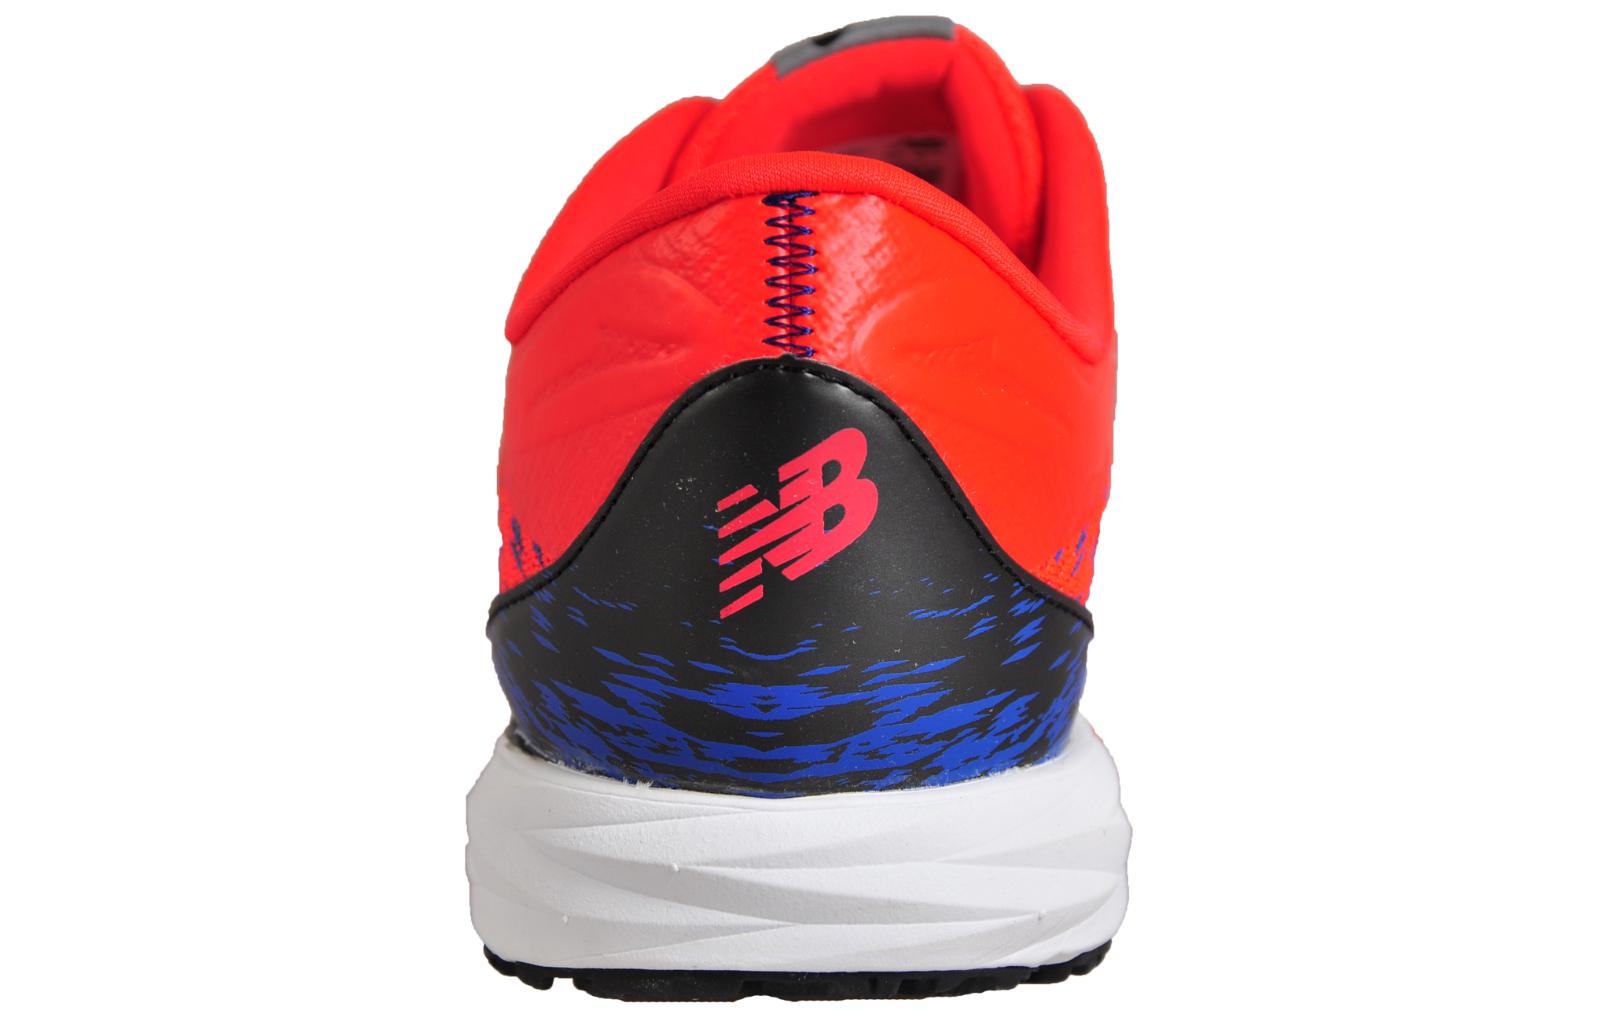 dc59b7ecd7b6 New Balance Speedride Strobe Men s Running Shoes Gym Trainers UK 9.5 Wide  Fit